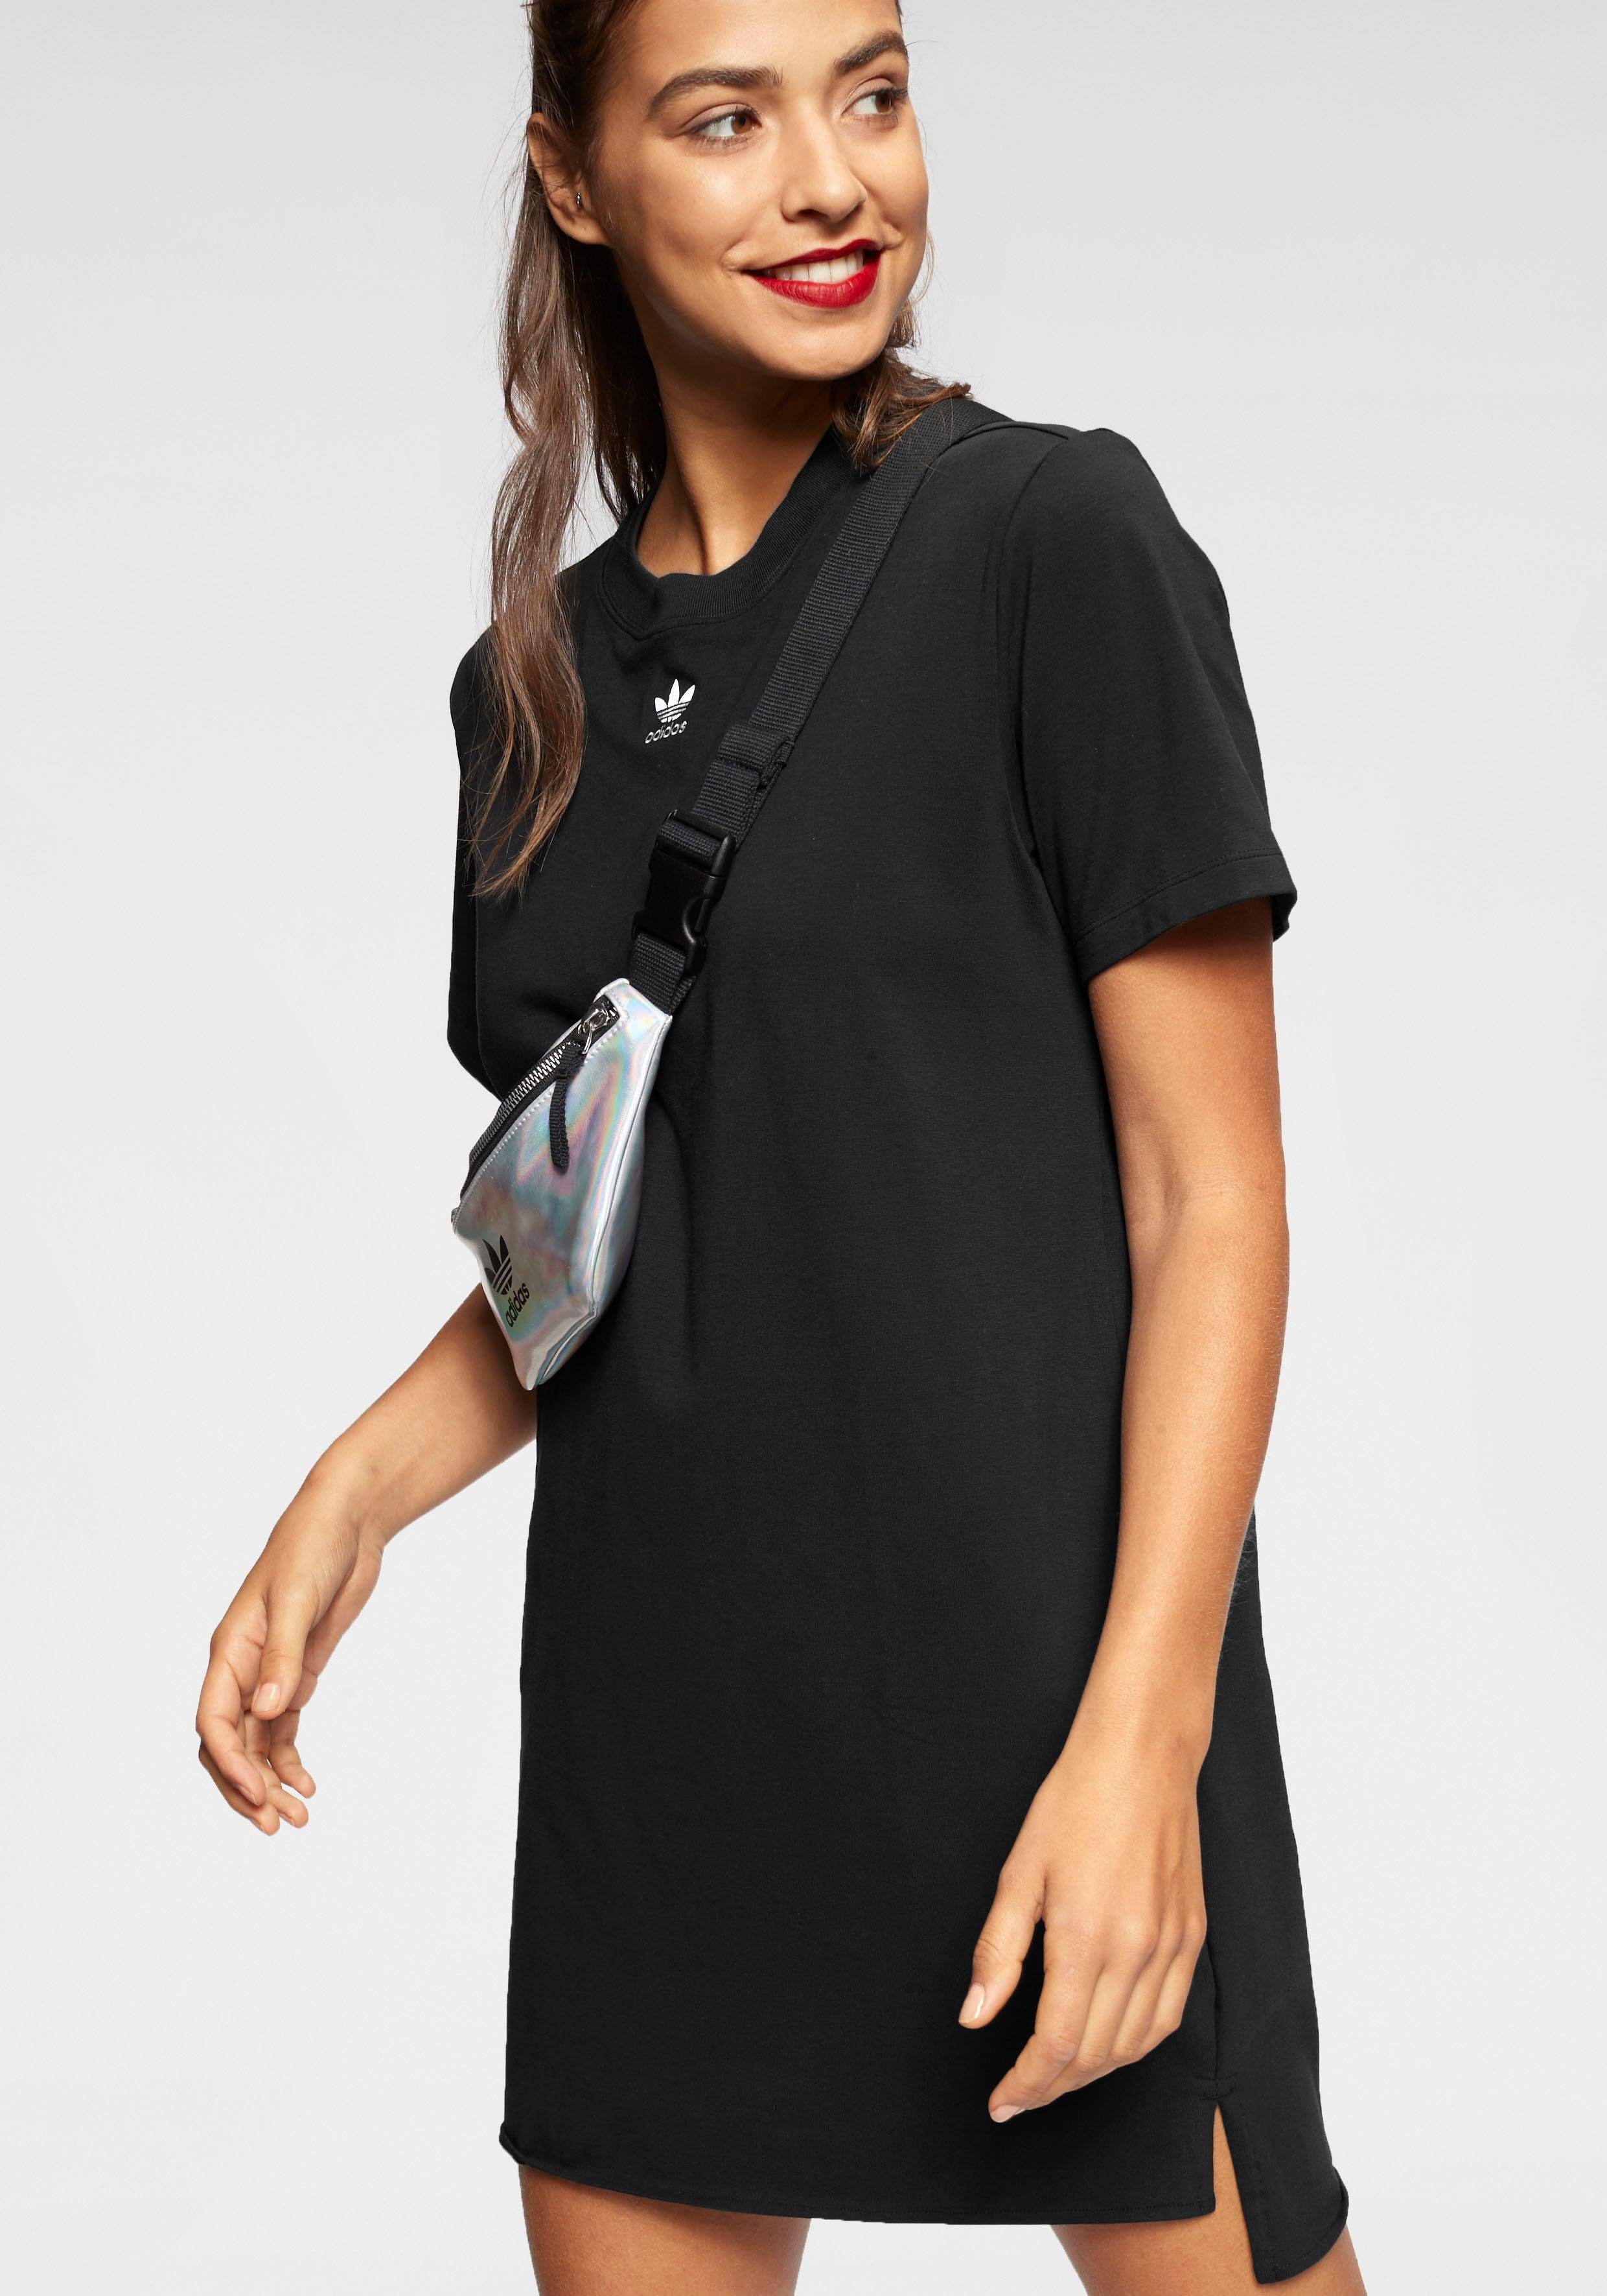 adidas Originals Shirtkleid »FREFOIL DRESS« kaufen   OTTO